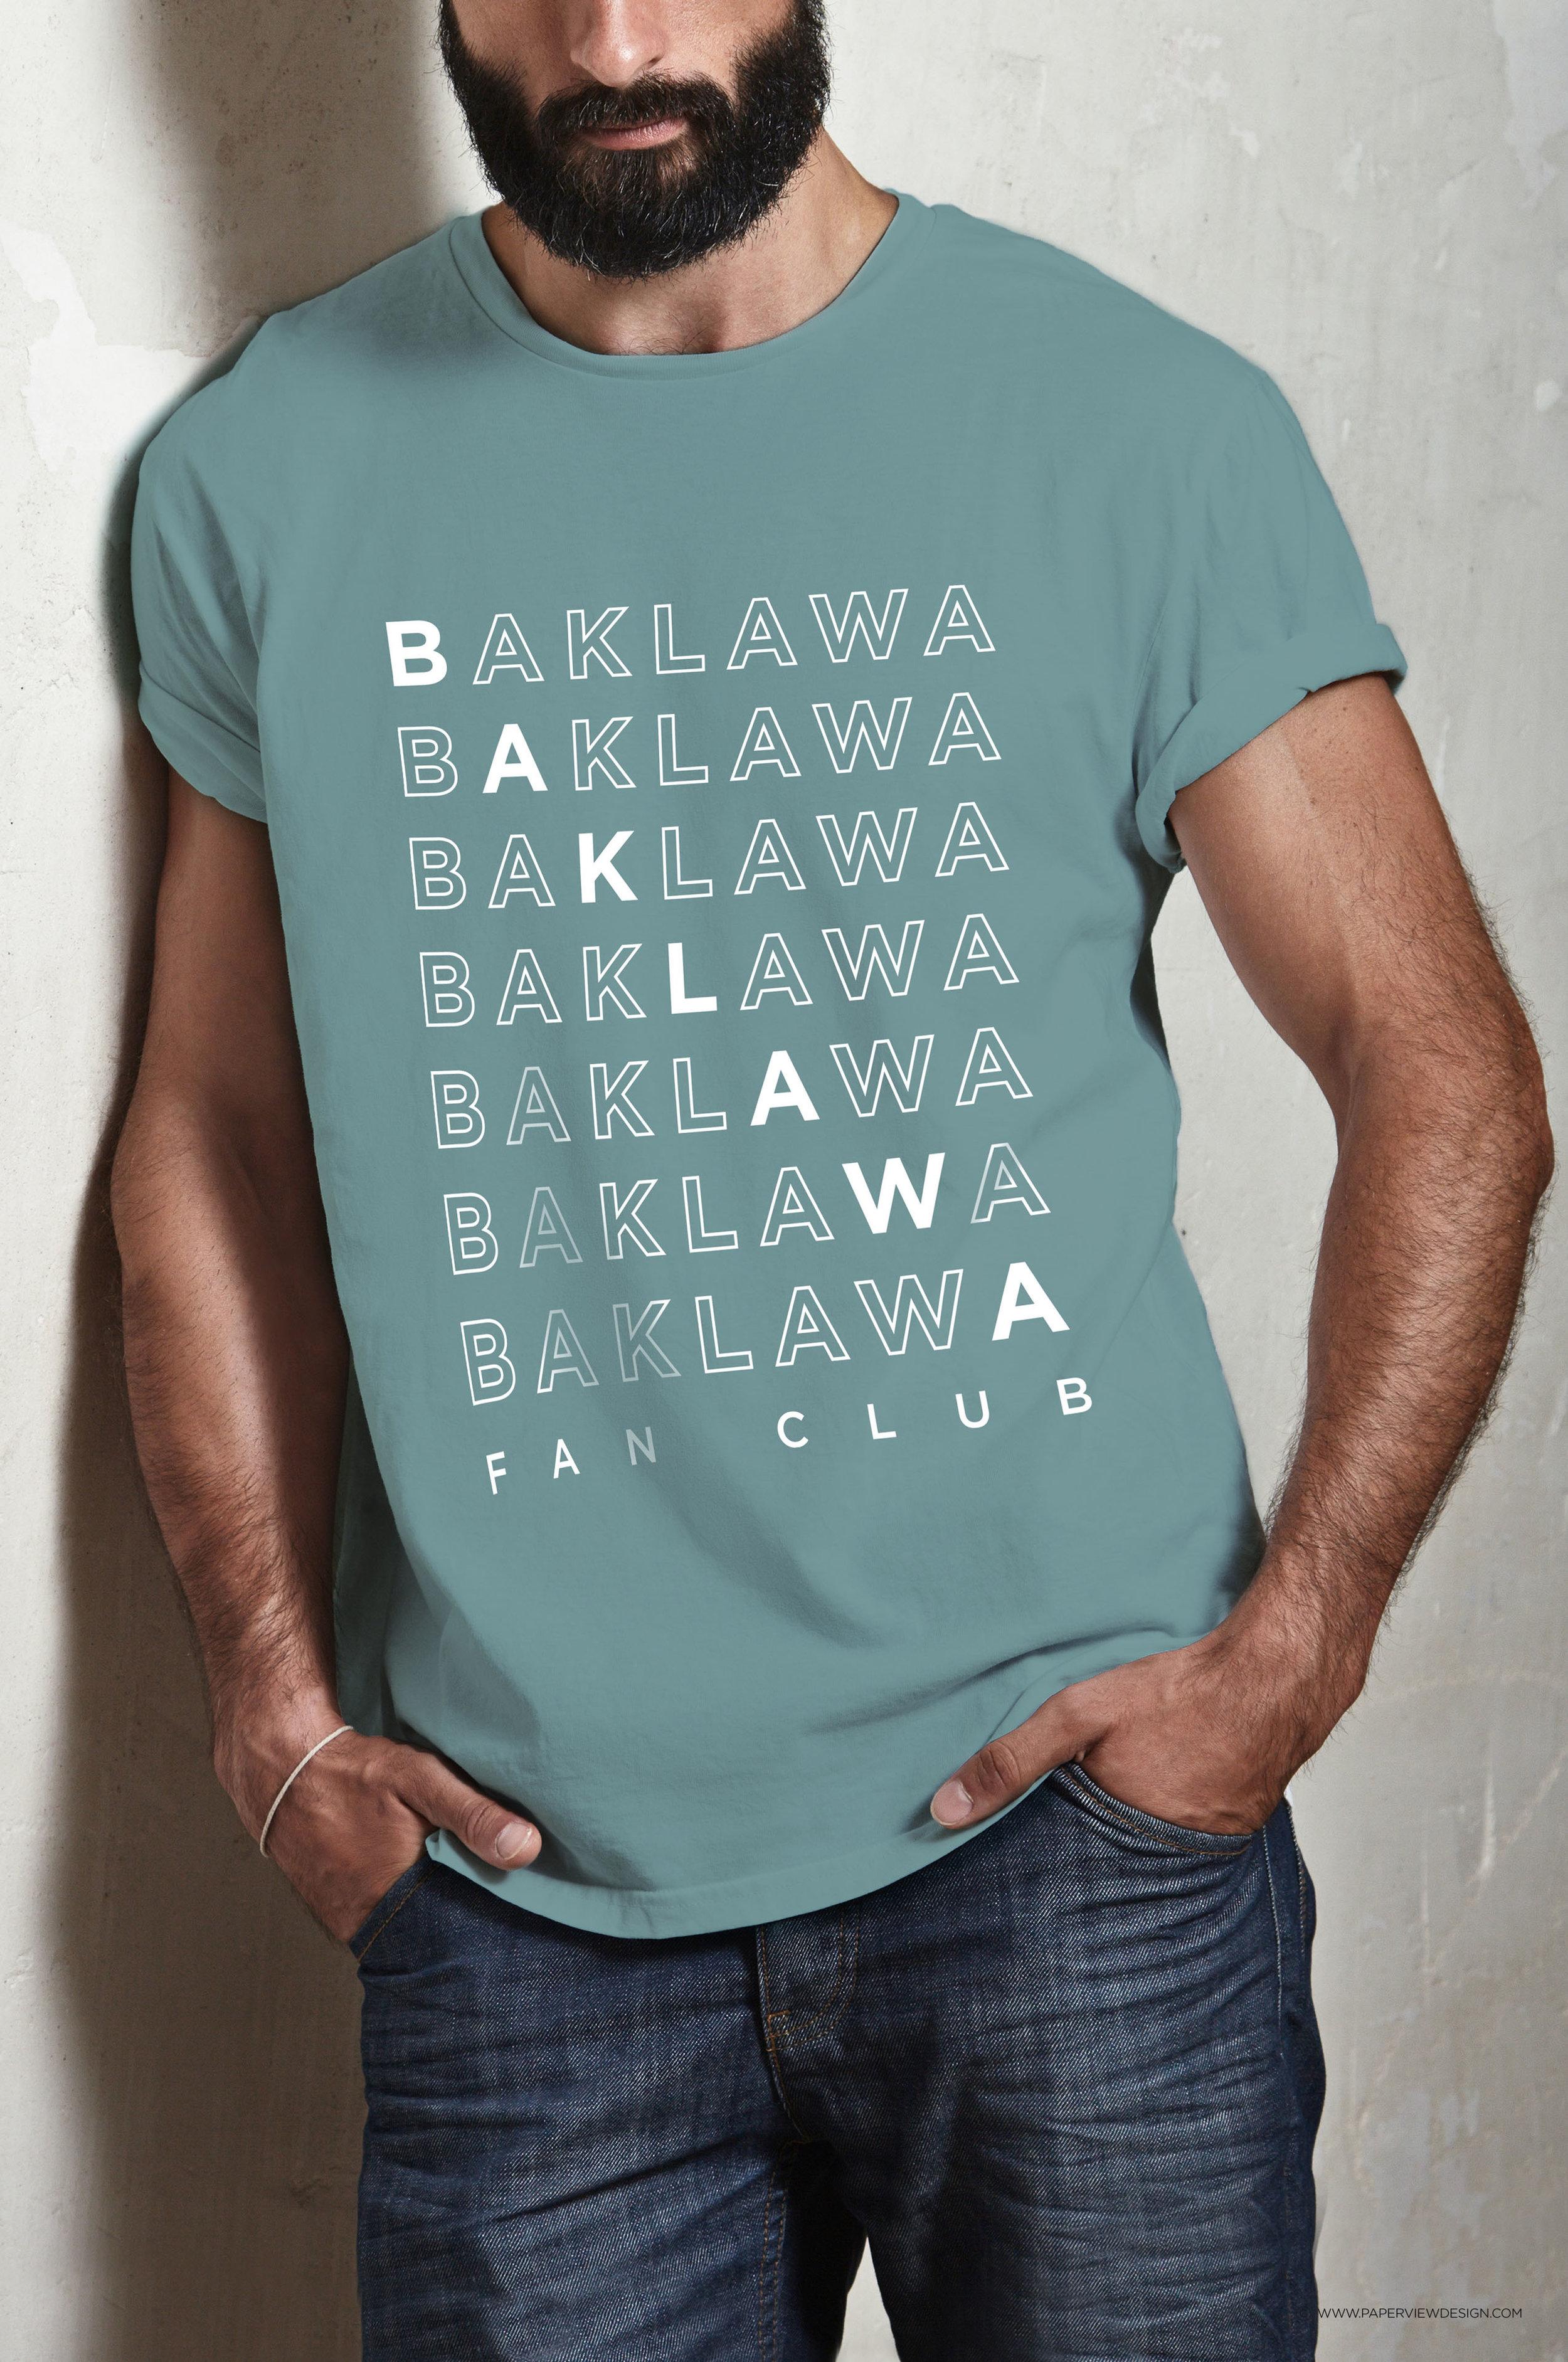 Tariq-Pastries-Uniform-Identity-Branding-Bahrain-T-Shirt